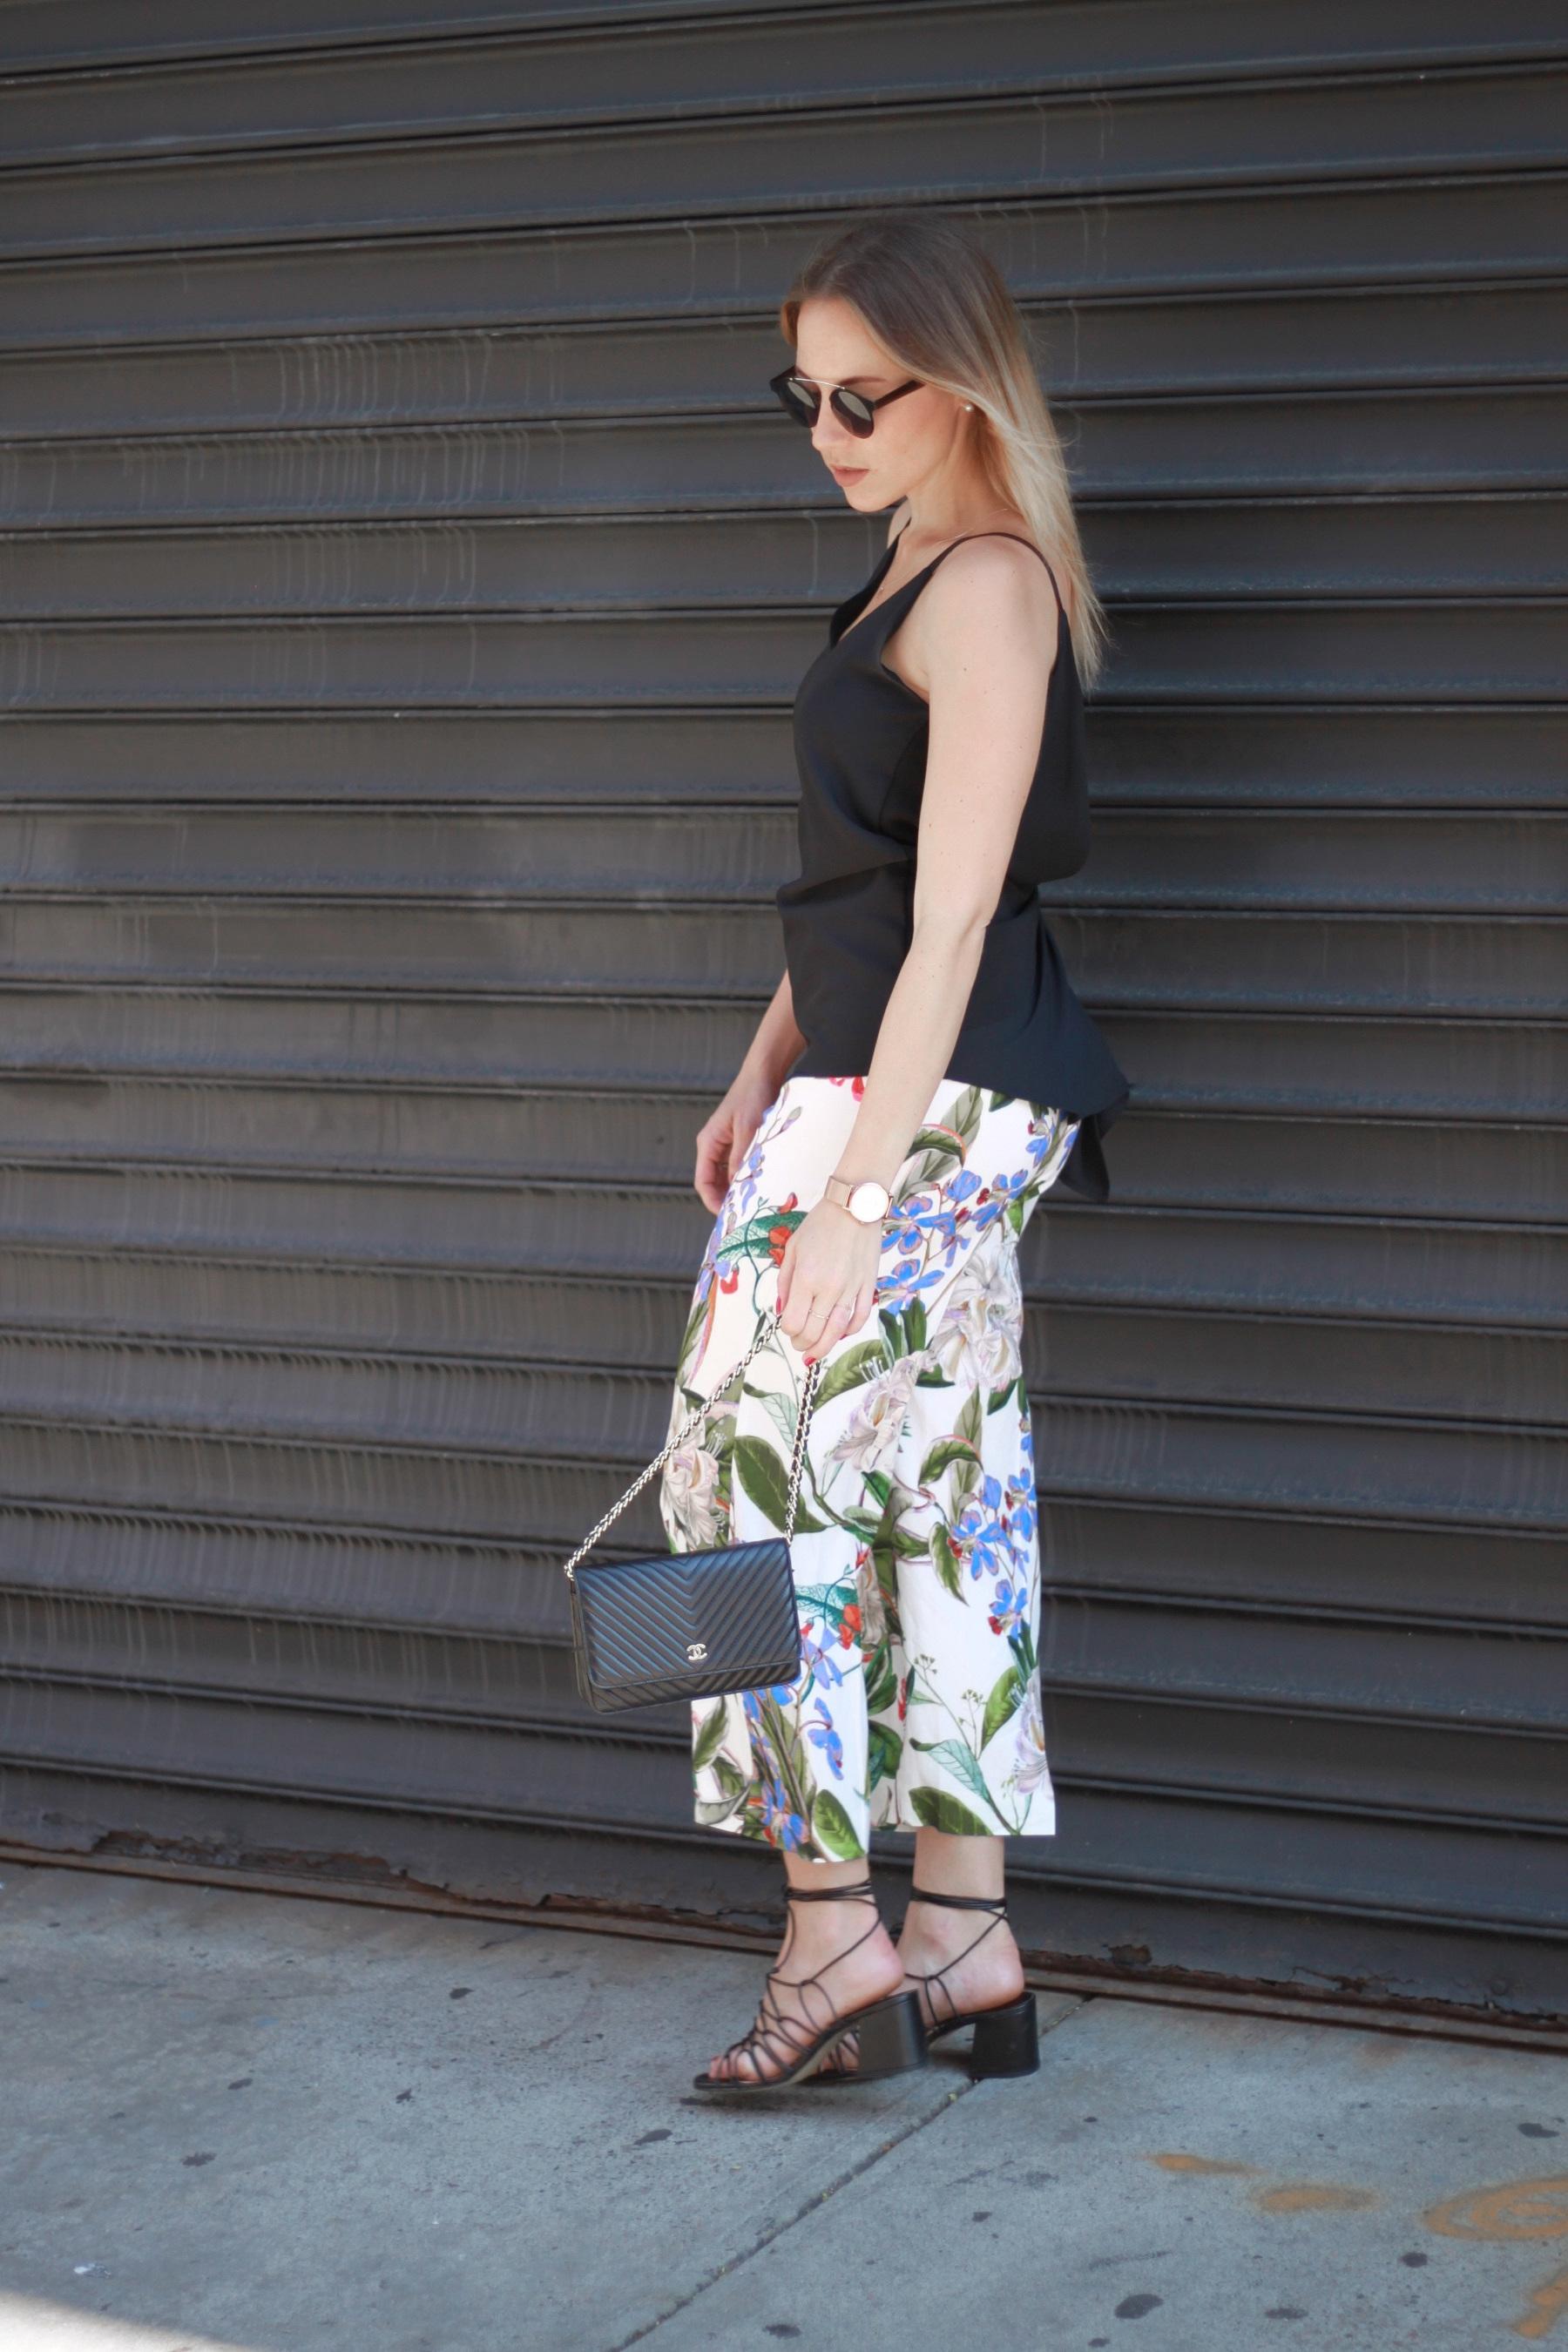 Flower culottes & lace up sandals (9)